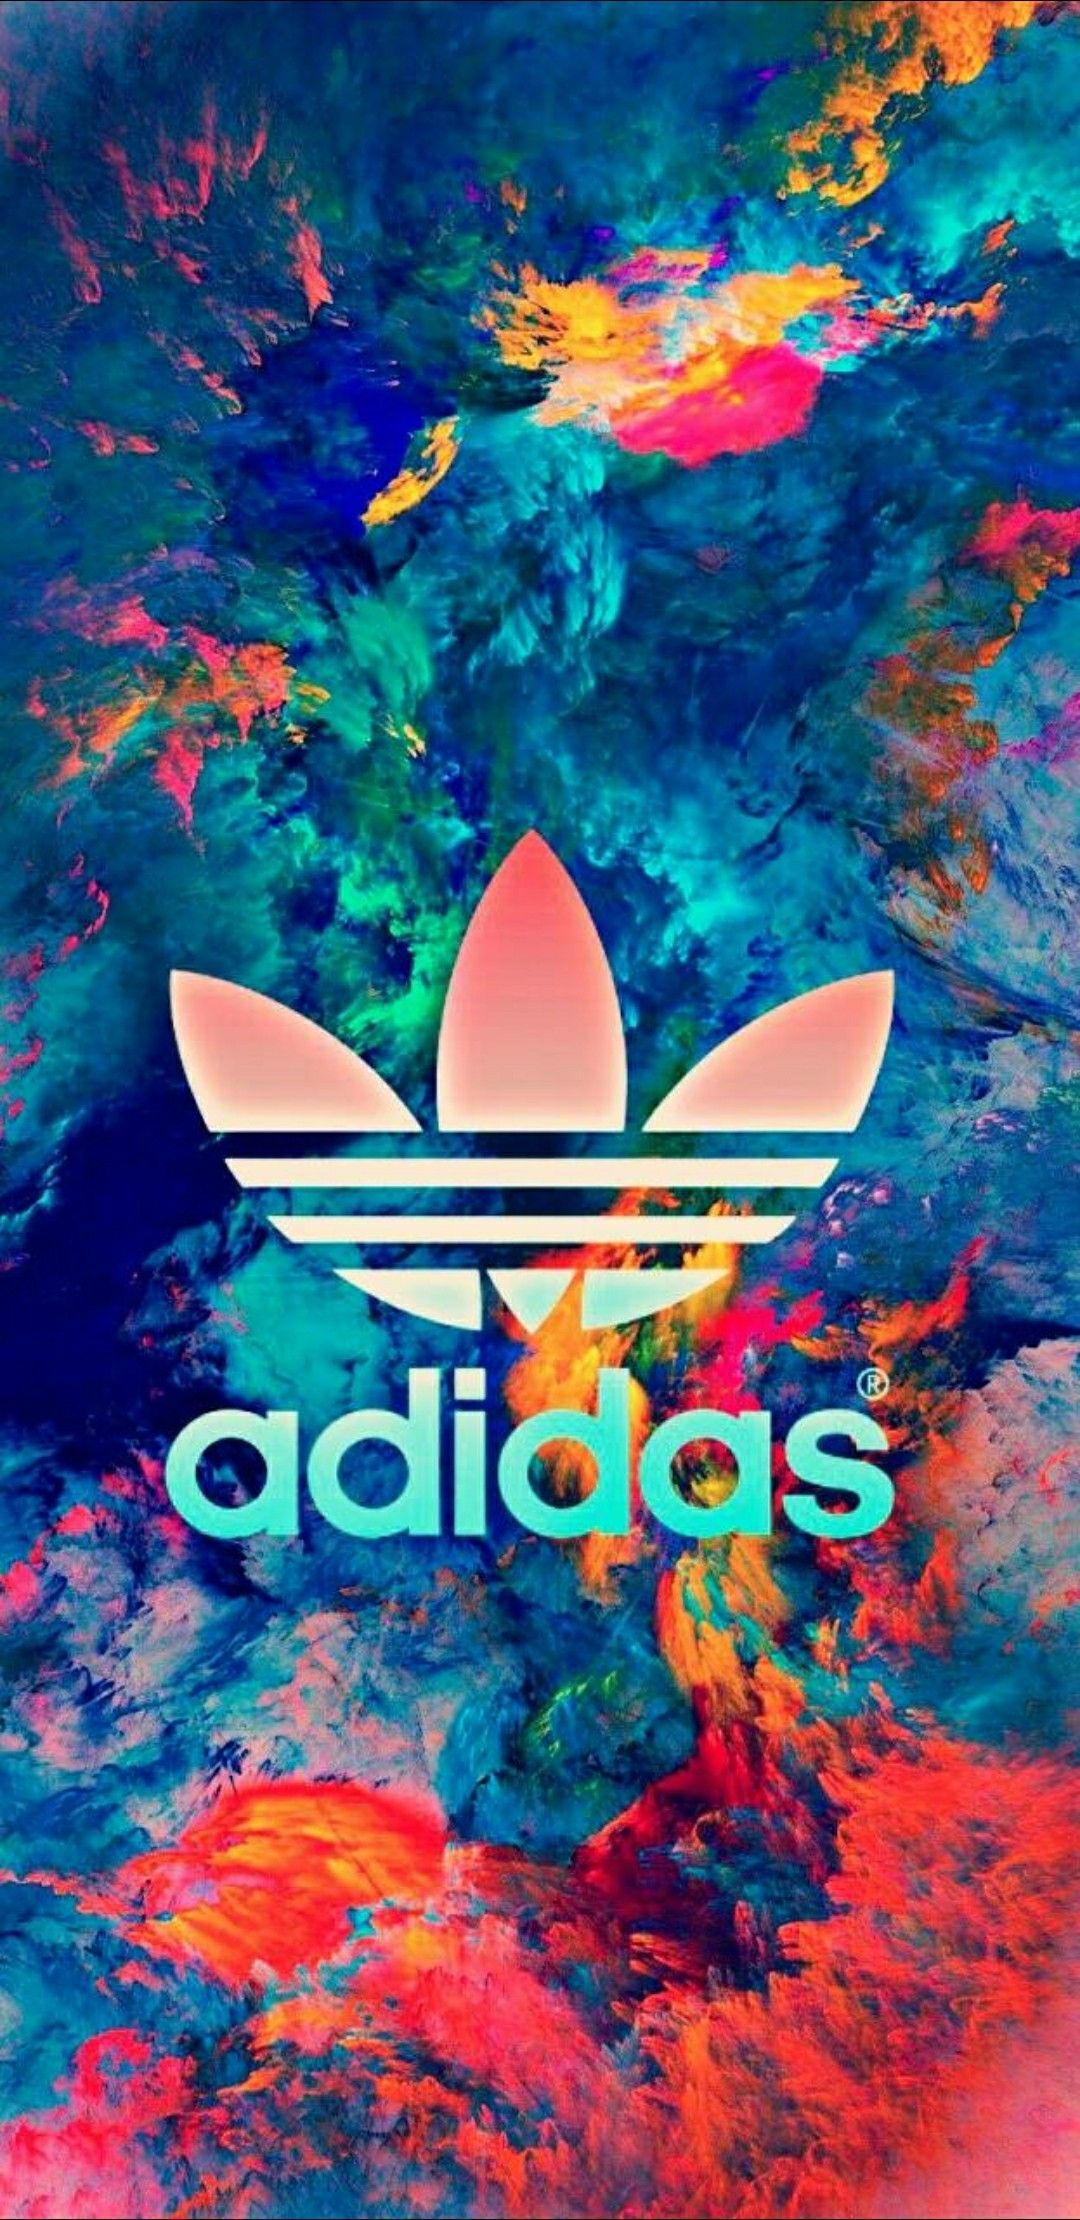 sentido Onza cavidad  Pinterest photo | Adidas logo wallpapers, Adidas wallpaper iphone, Adidas  wallpapers